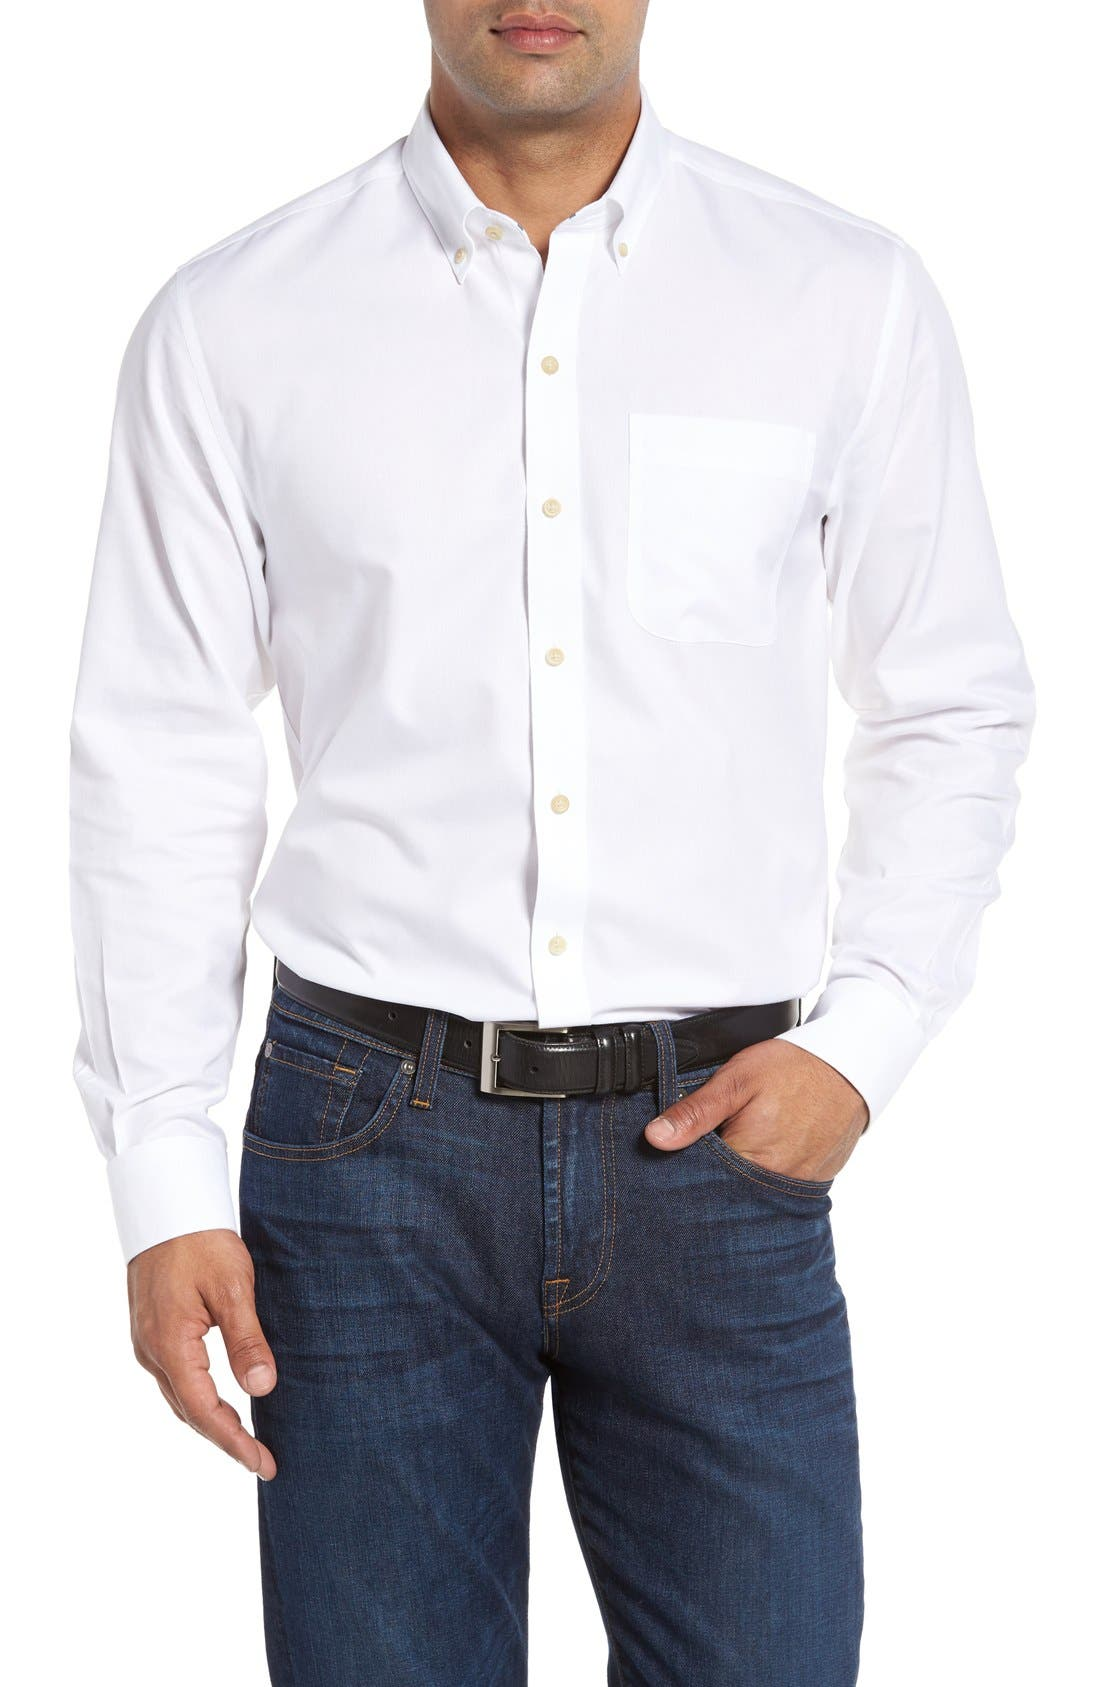 San Juan Classic Fit Wrinkle Free Solid Sport Shirt,                             Main thumbnail 1, color,                             White